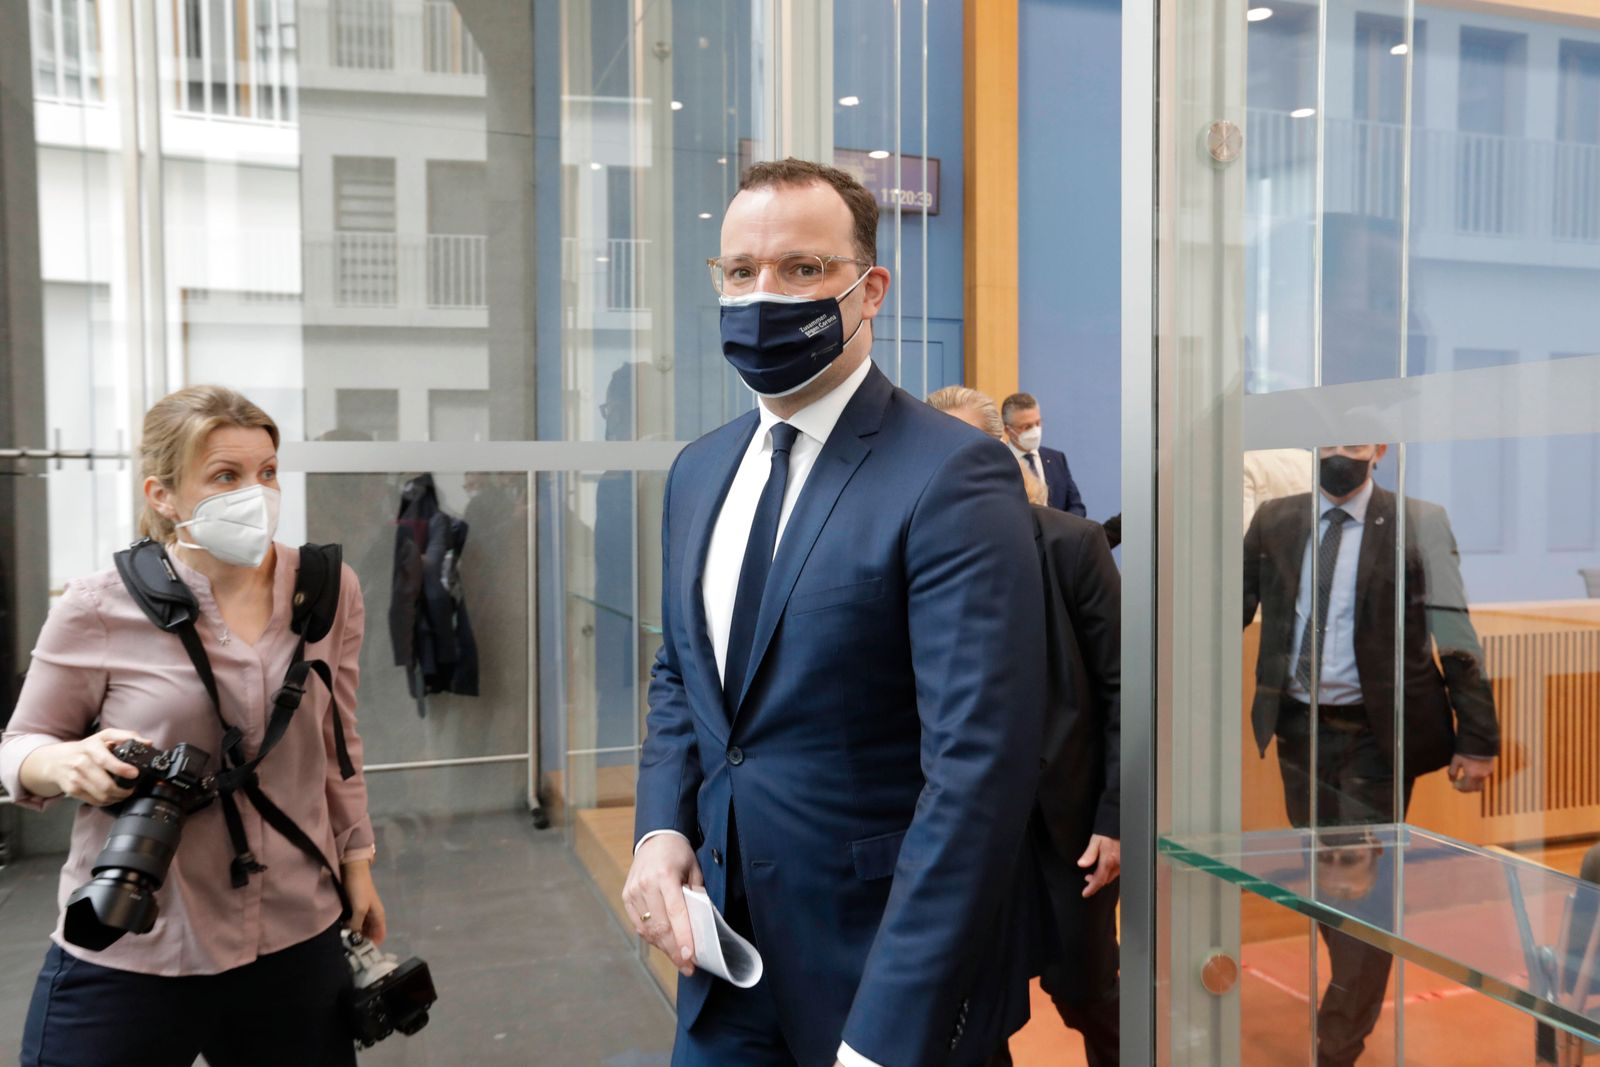 Jens Spahn, Bundesminister fuer Gesundheit, CDU, PK zu - Aktuelle Corona-Lage, DEU, Berlin, 21.05.2021 *** Jens Spahn, F